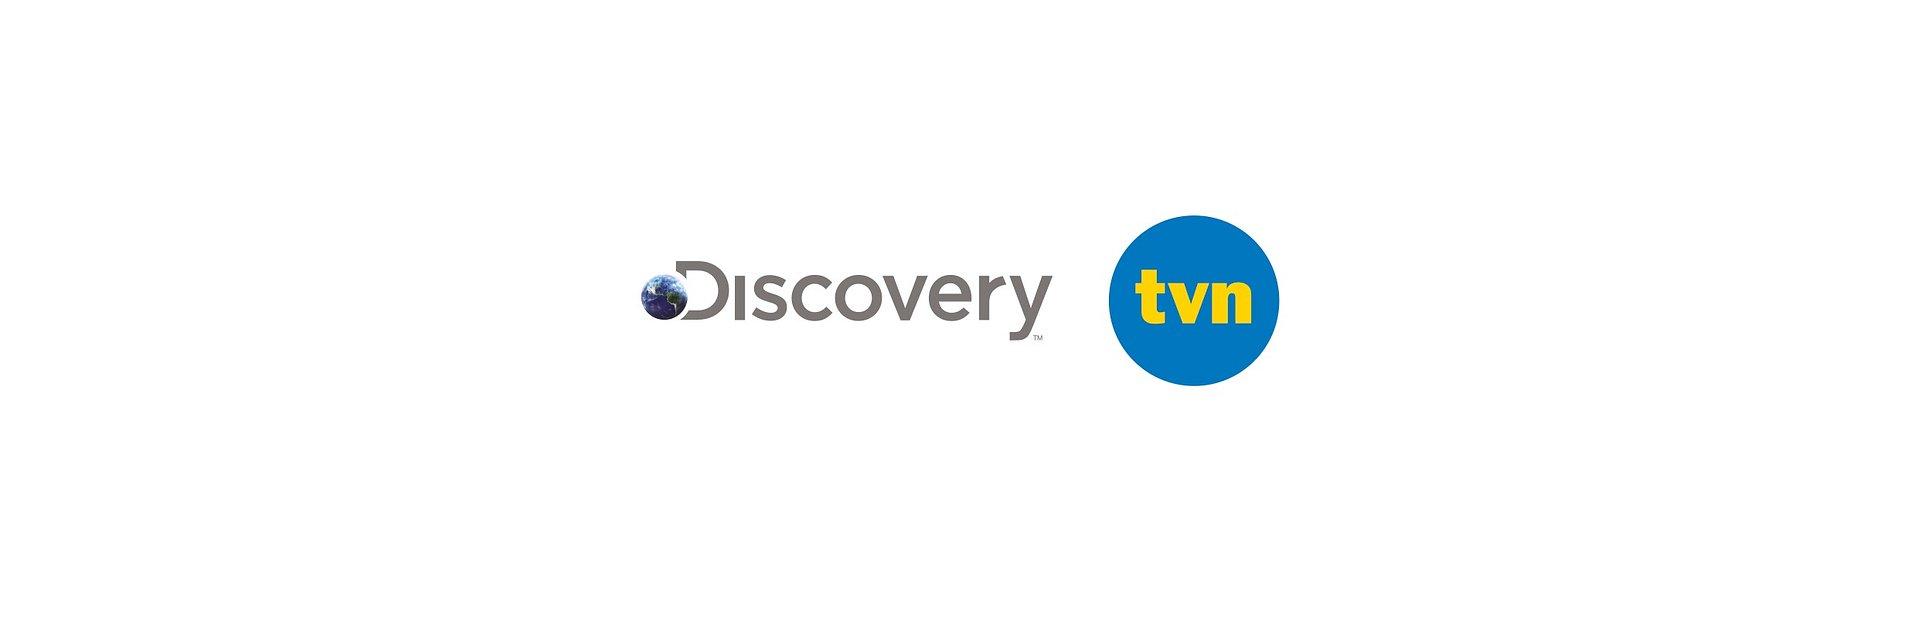 TVN Discovery Polska rozpocznie współpracę z Mediacom